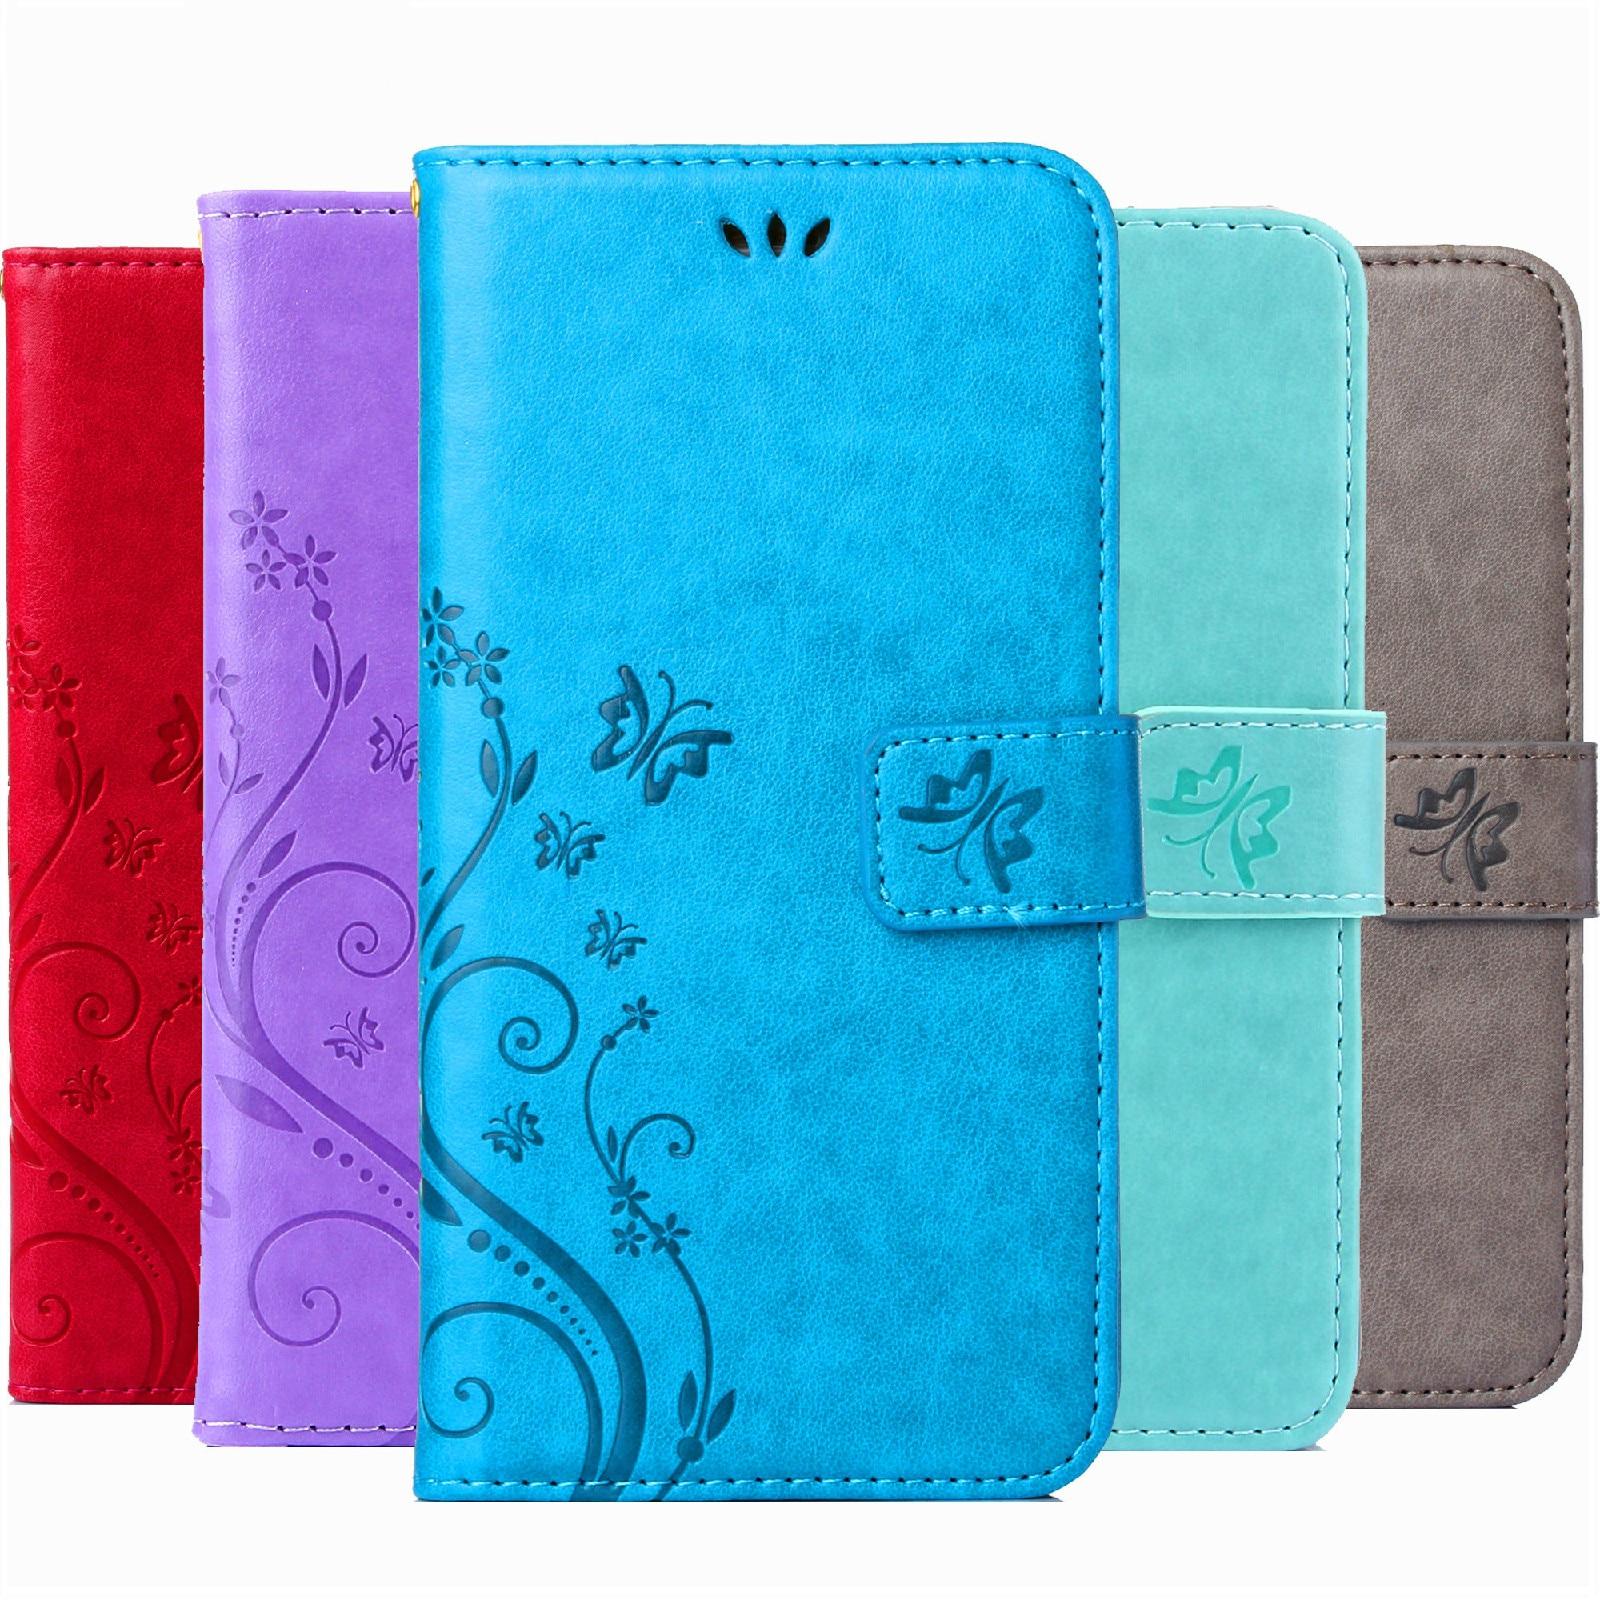 For Motorola Moto G4 G5 G6 Plus Luxury Flip Case Leather Wallet Cover Phone Bags For Lenovo Moto E5 Plus C Plus Cases Coque